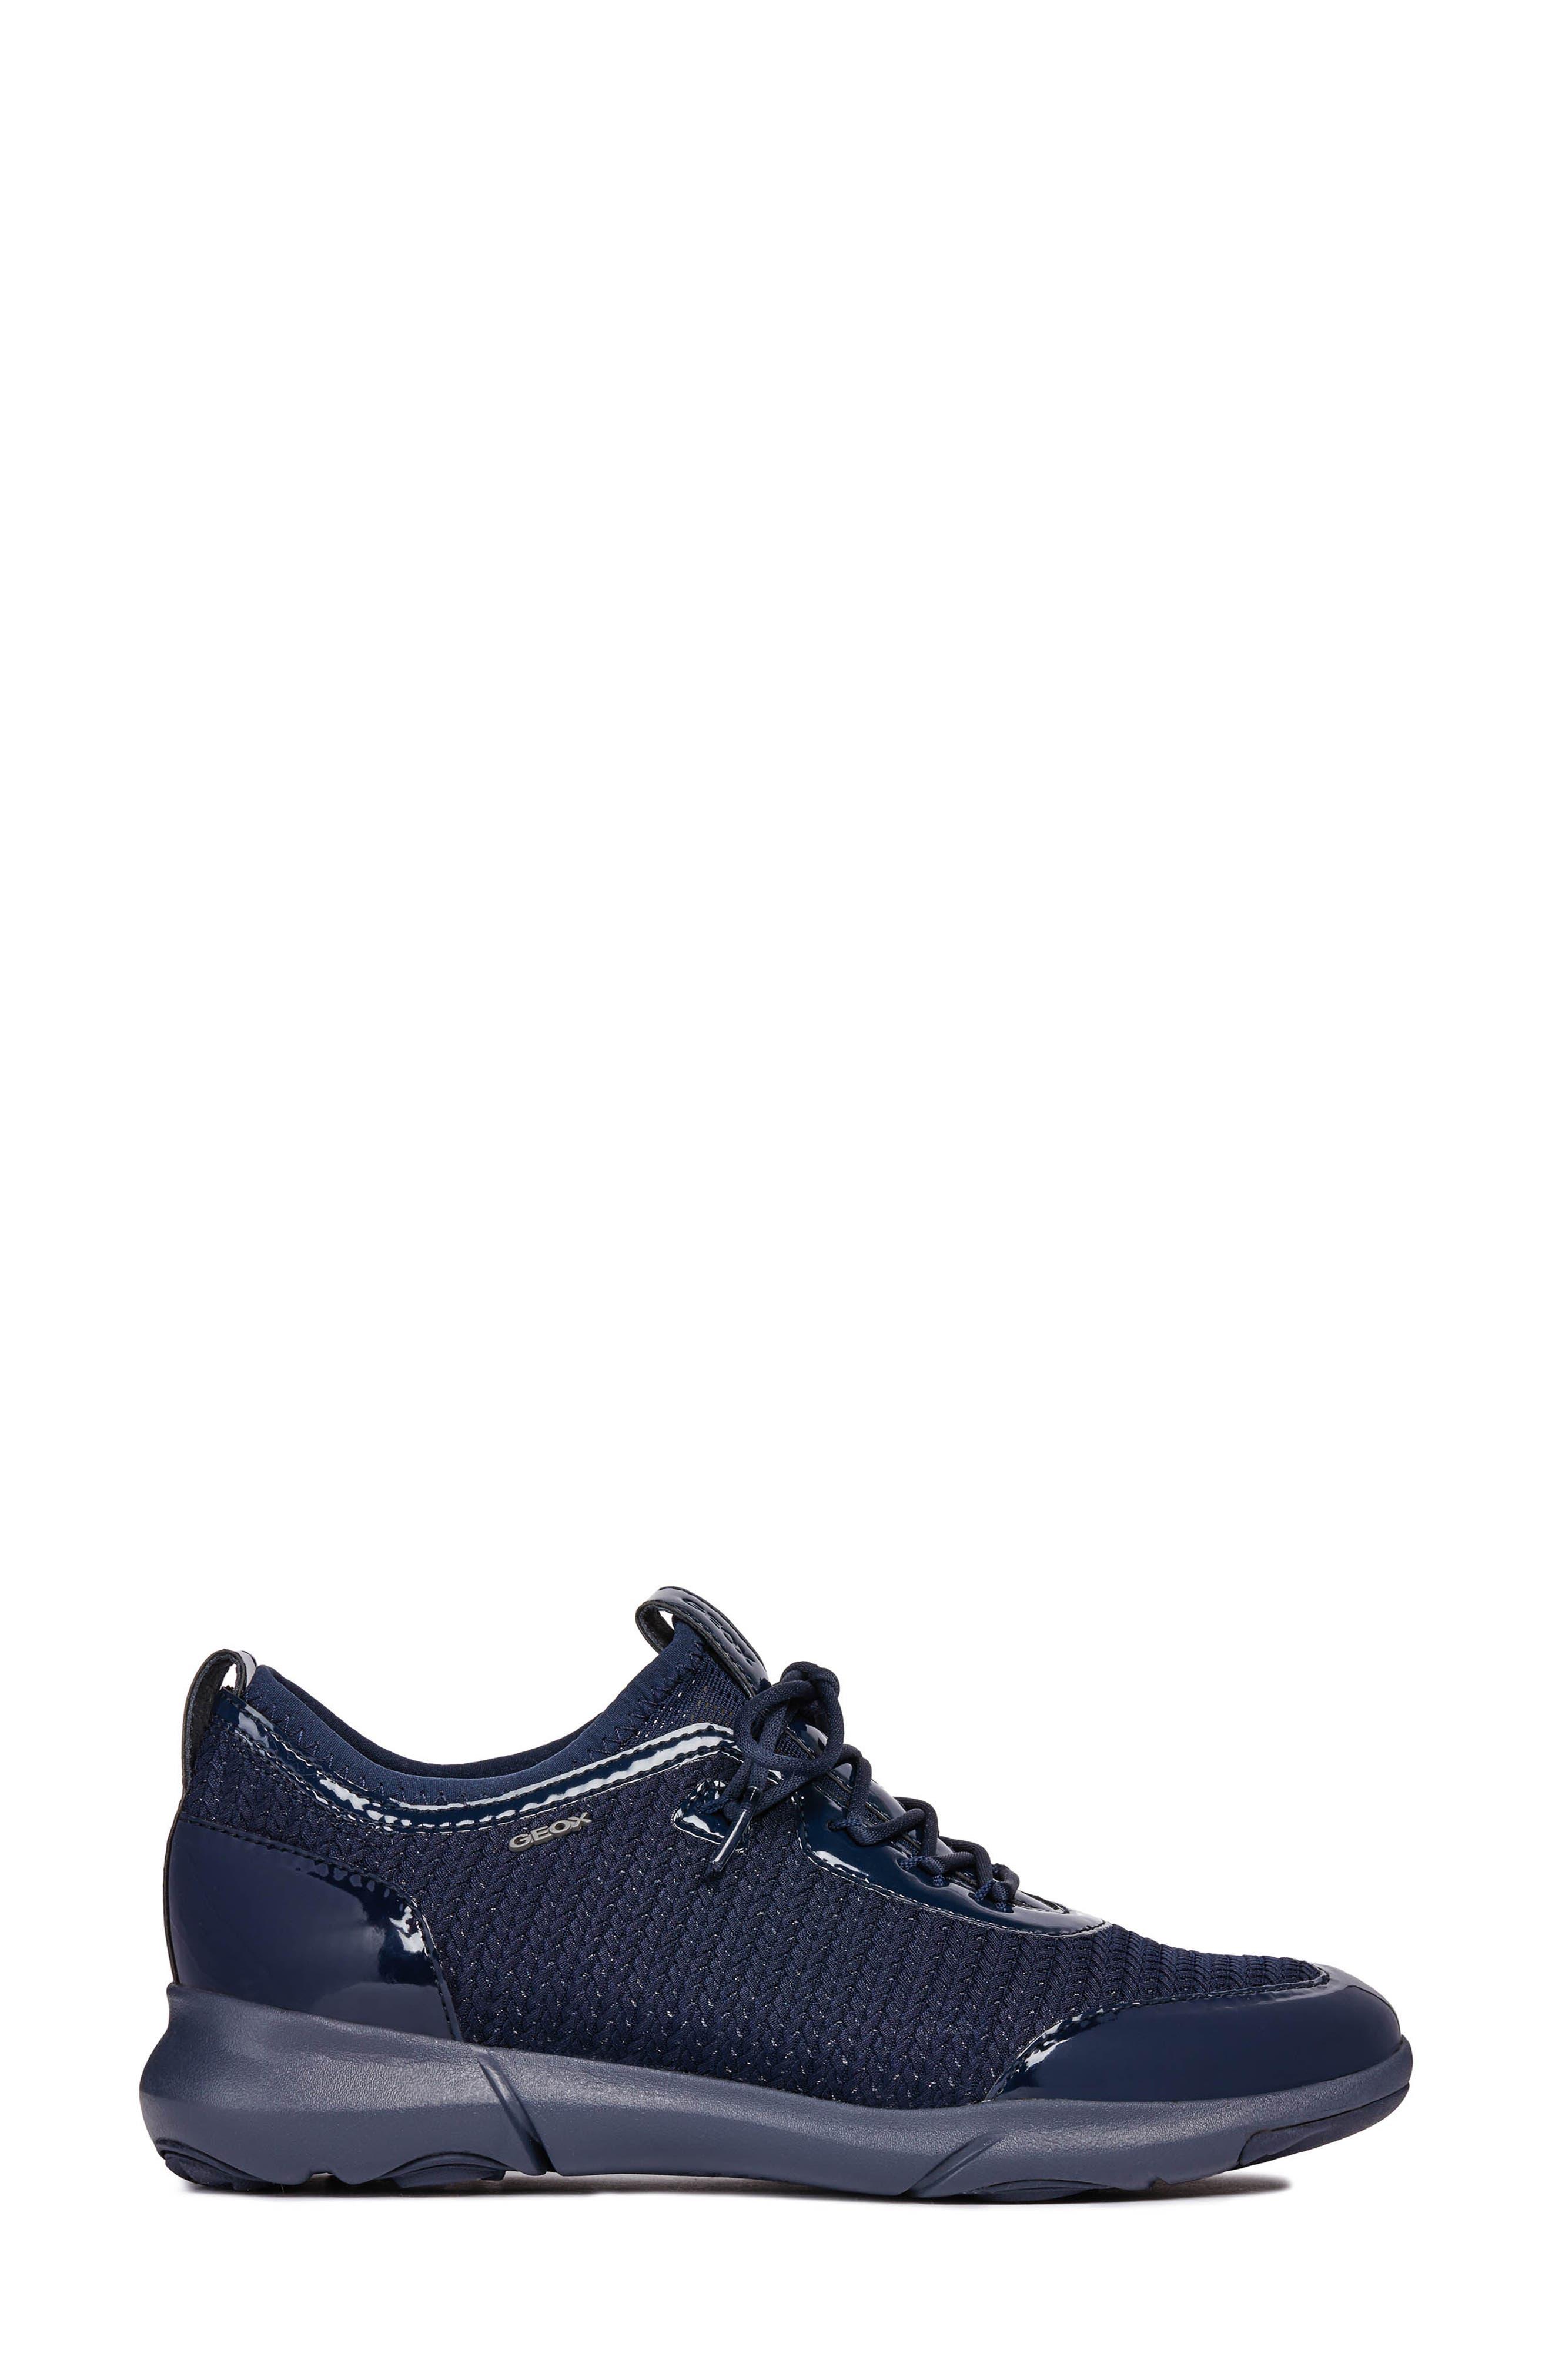 Nebula X Sneaker,                             Alternate thumbnail 3, color,                             NAVY FABRIC